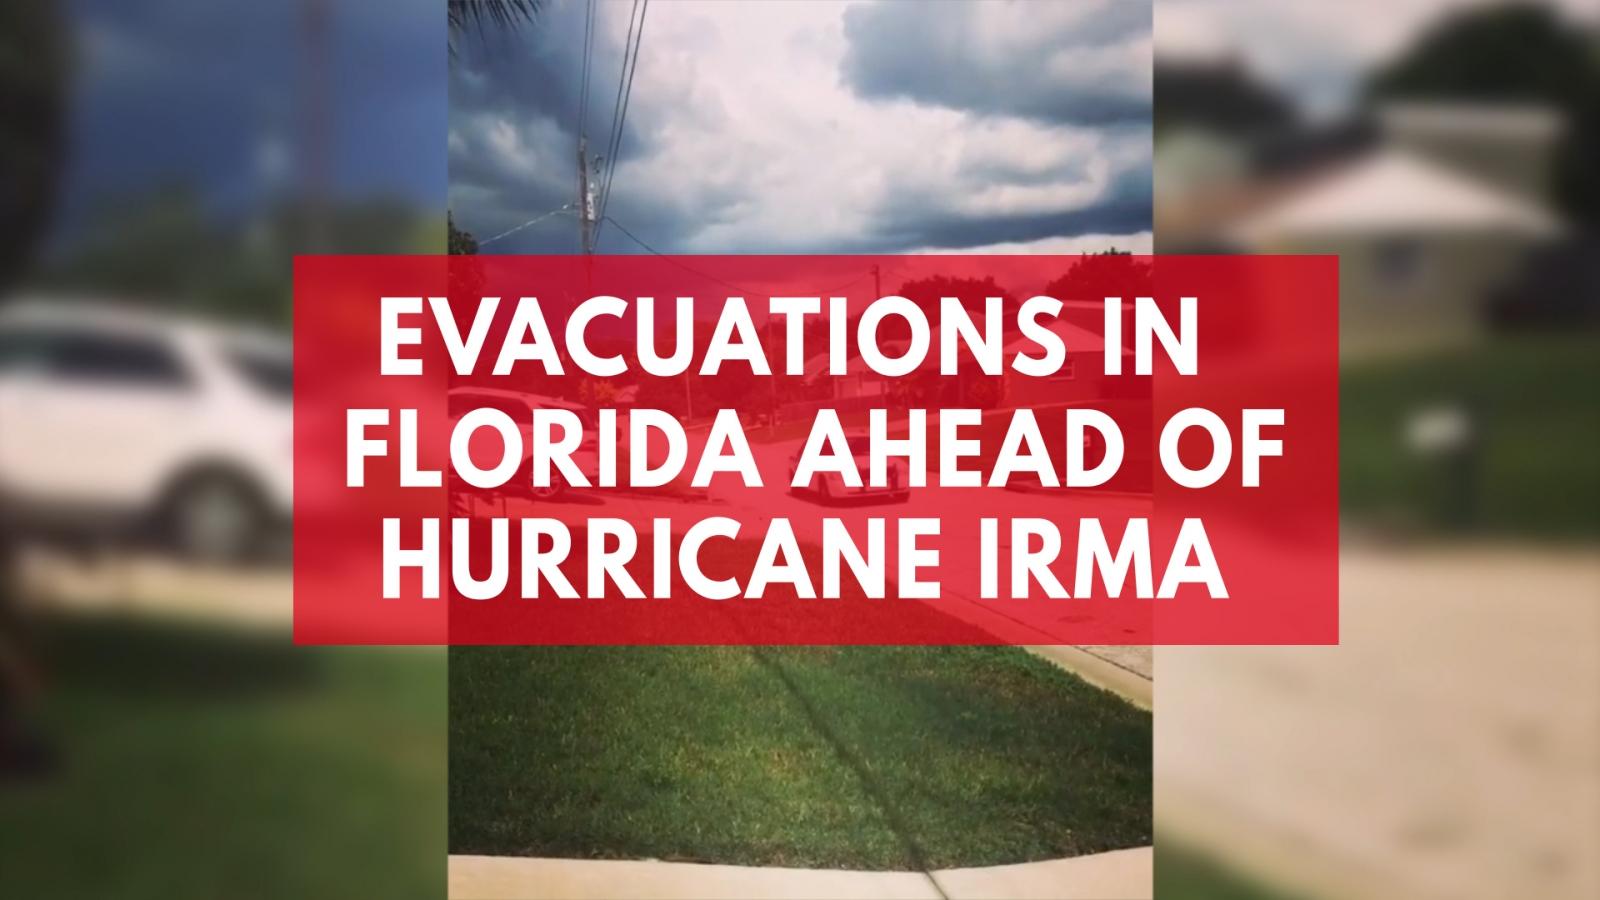 evacuations-in-florida-ahead-of-hurricane-irma